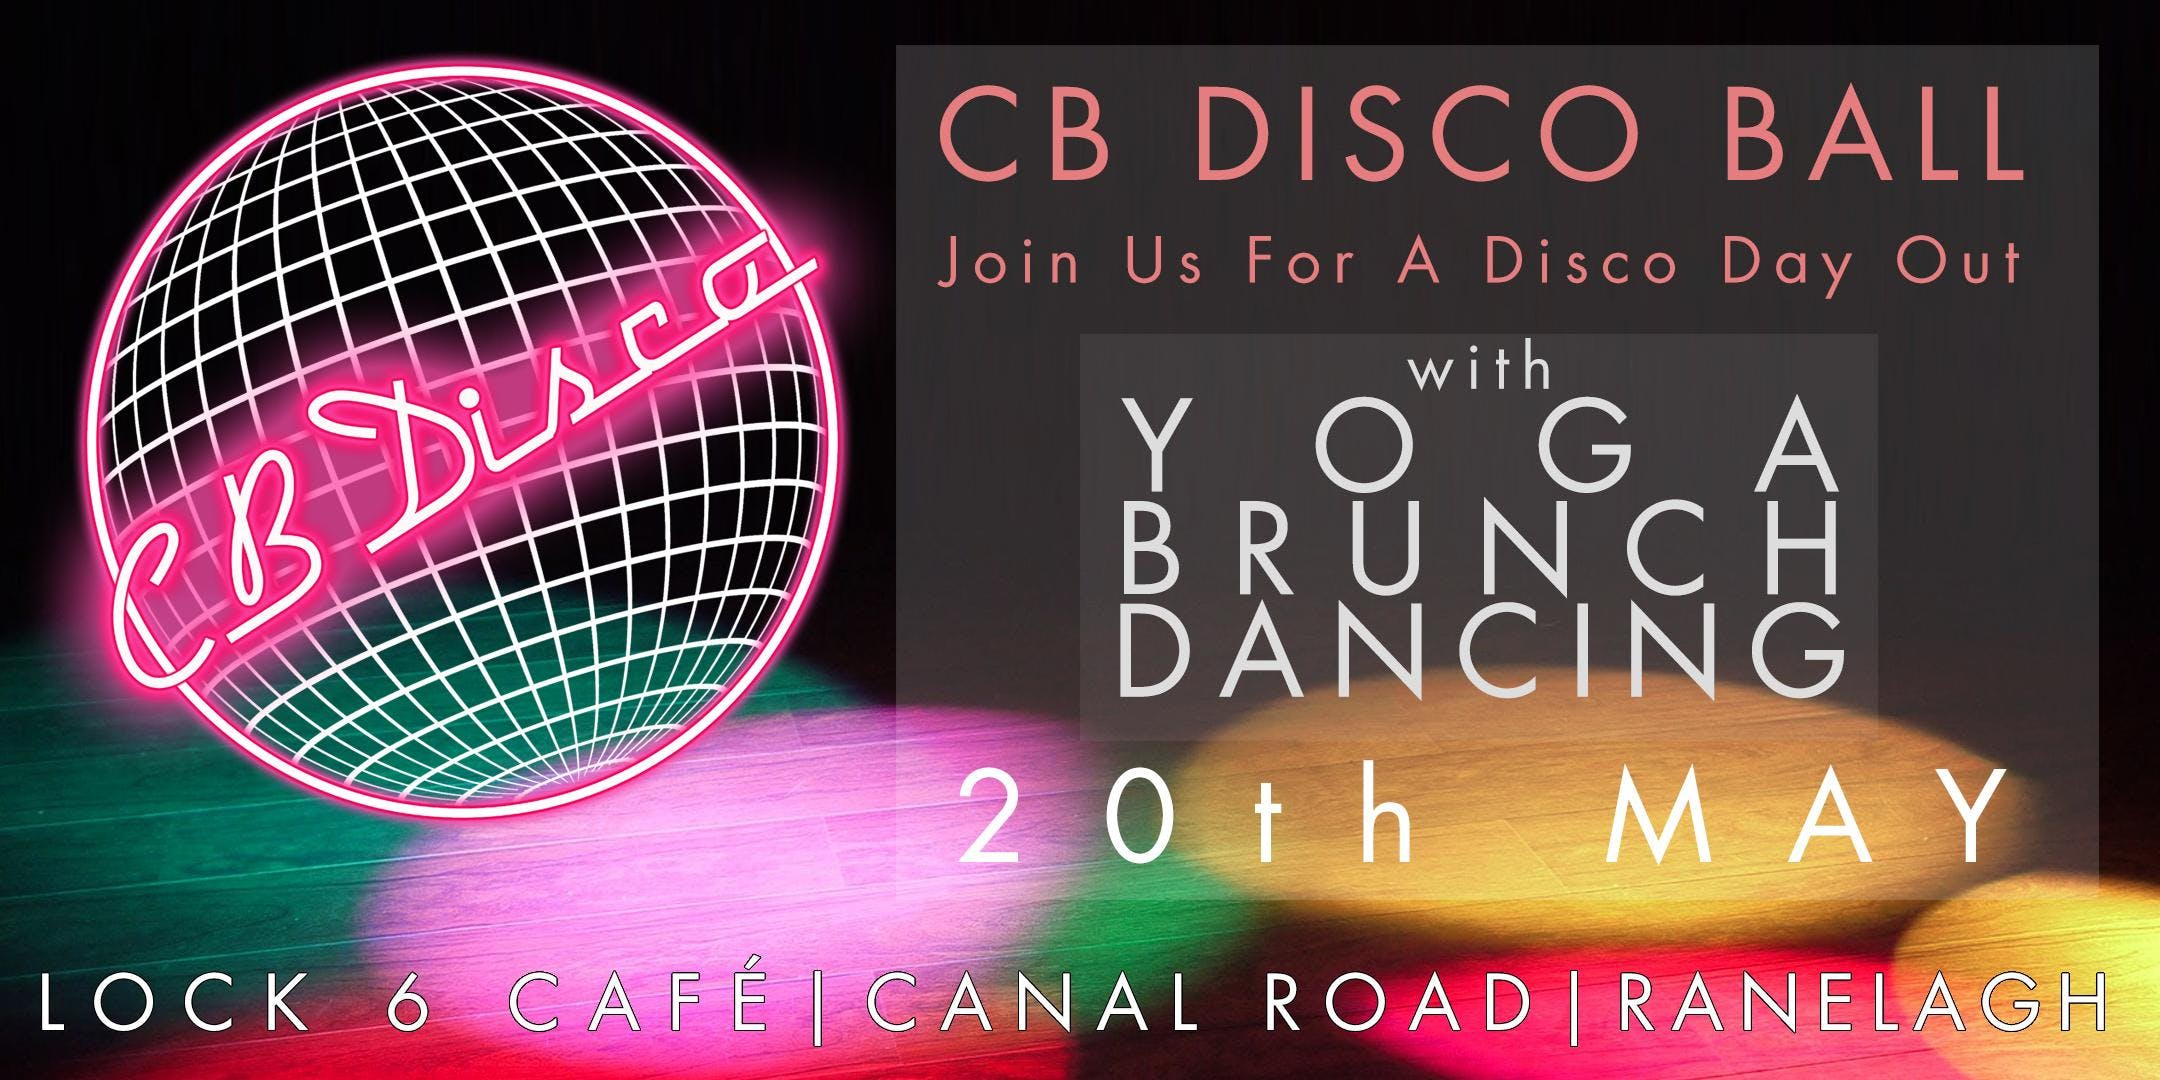 CB Disco Ball 1  Dublin